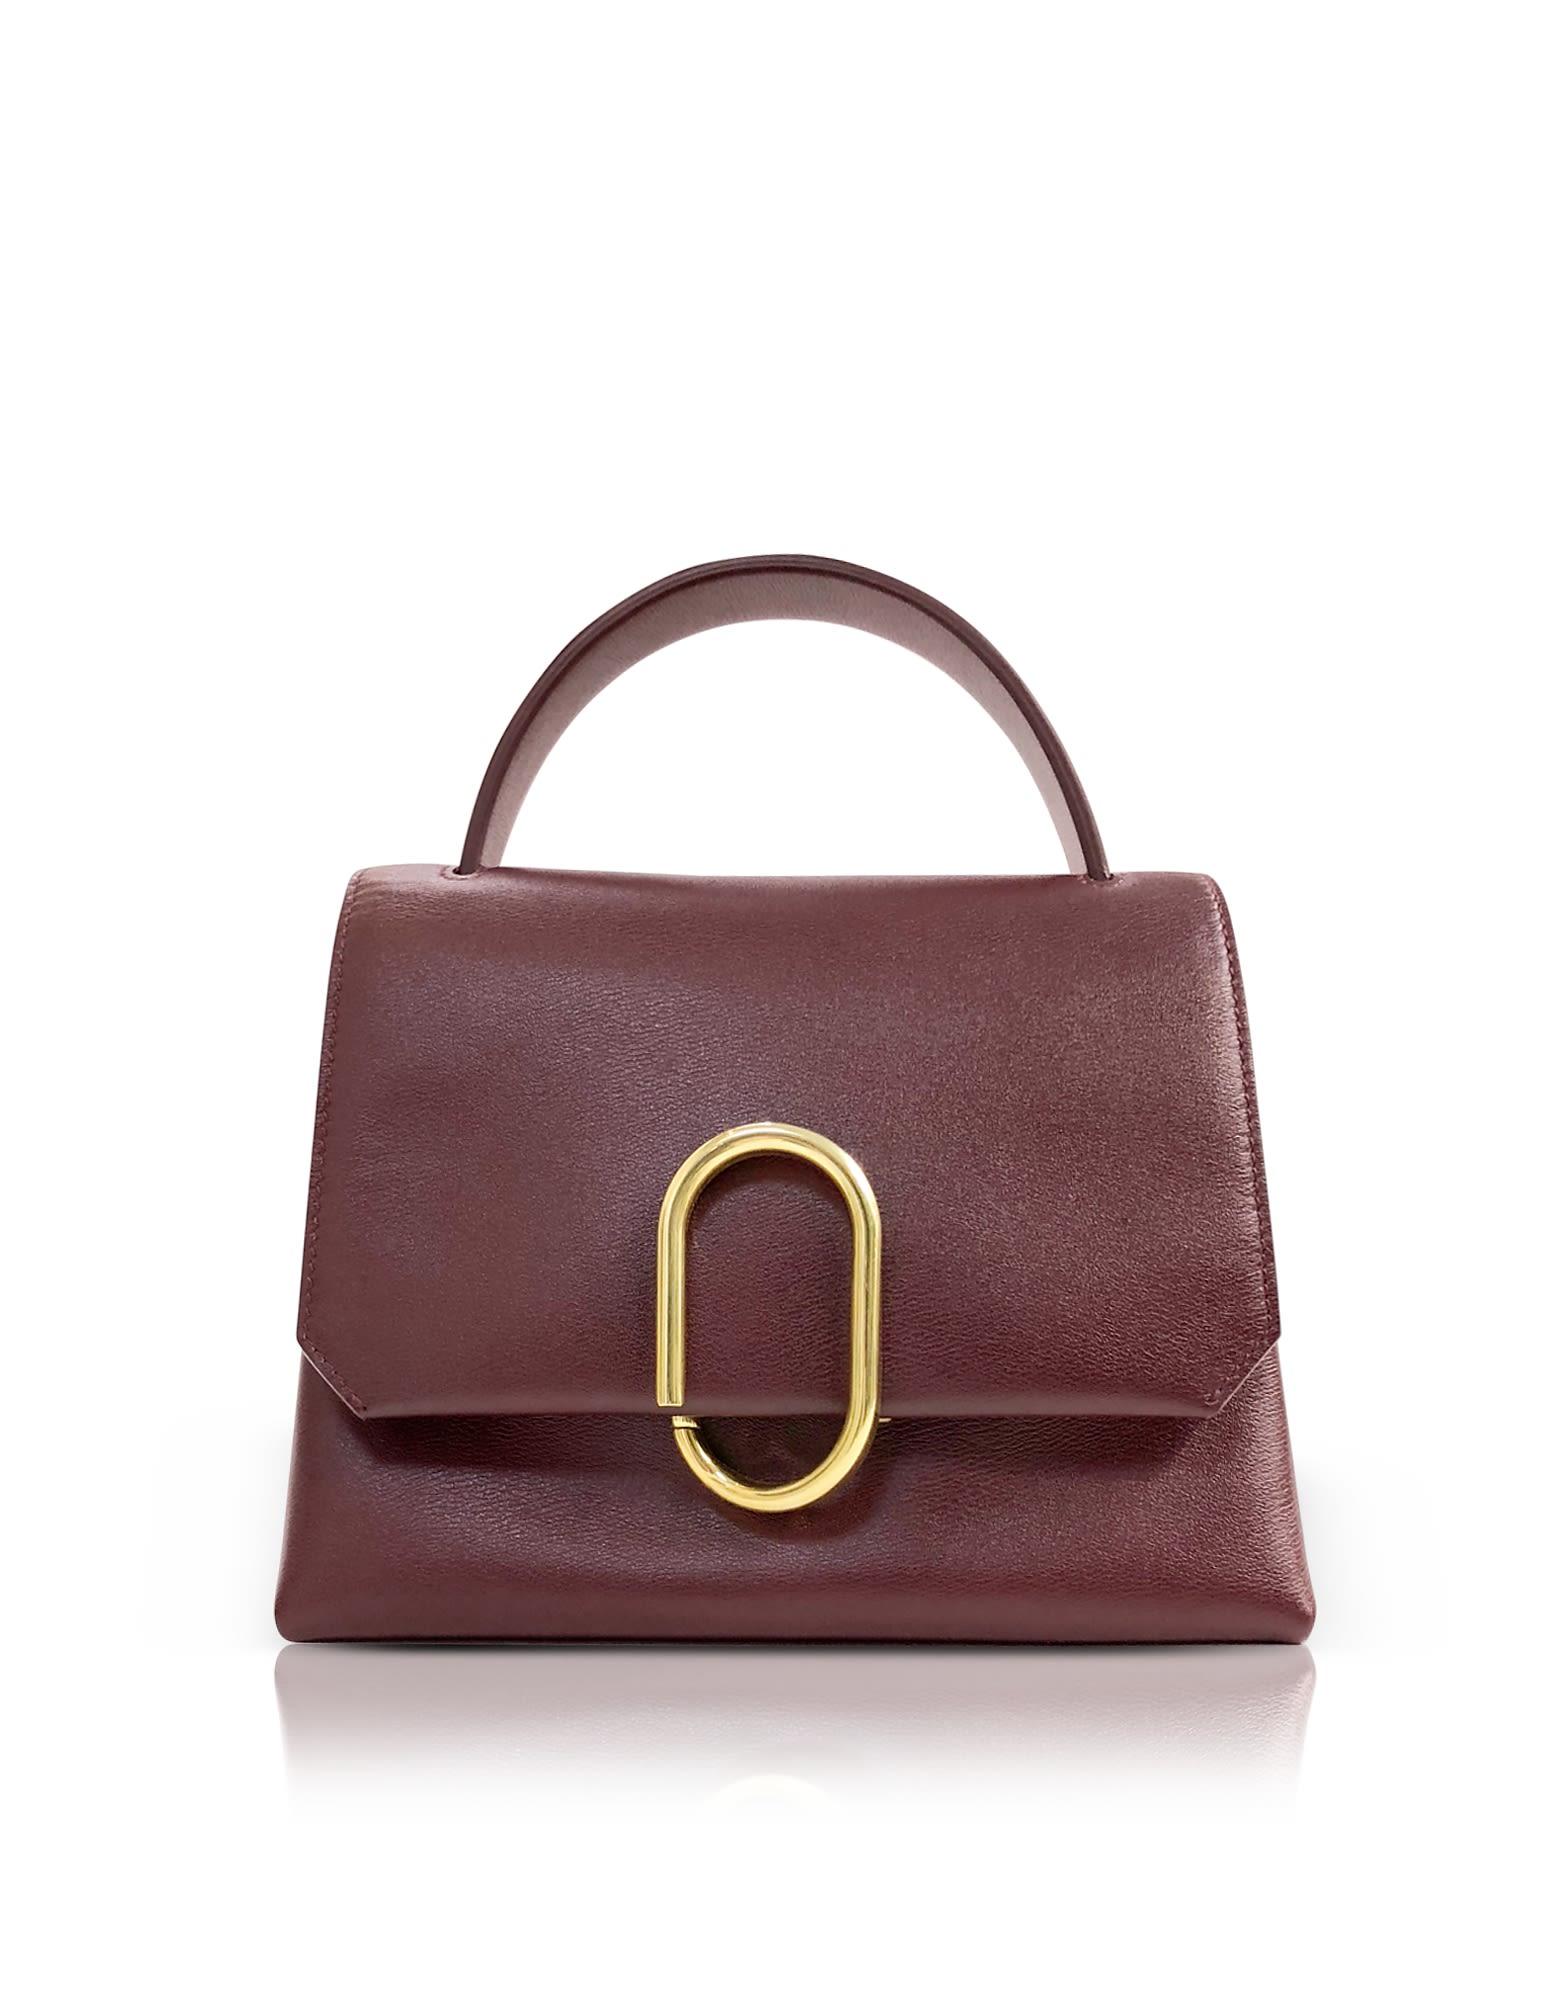 Bordeaux Alix Mini Top Handle Satchel Bag in Red